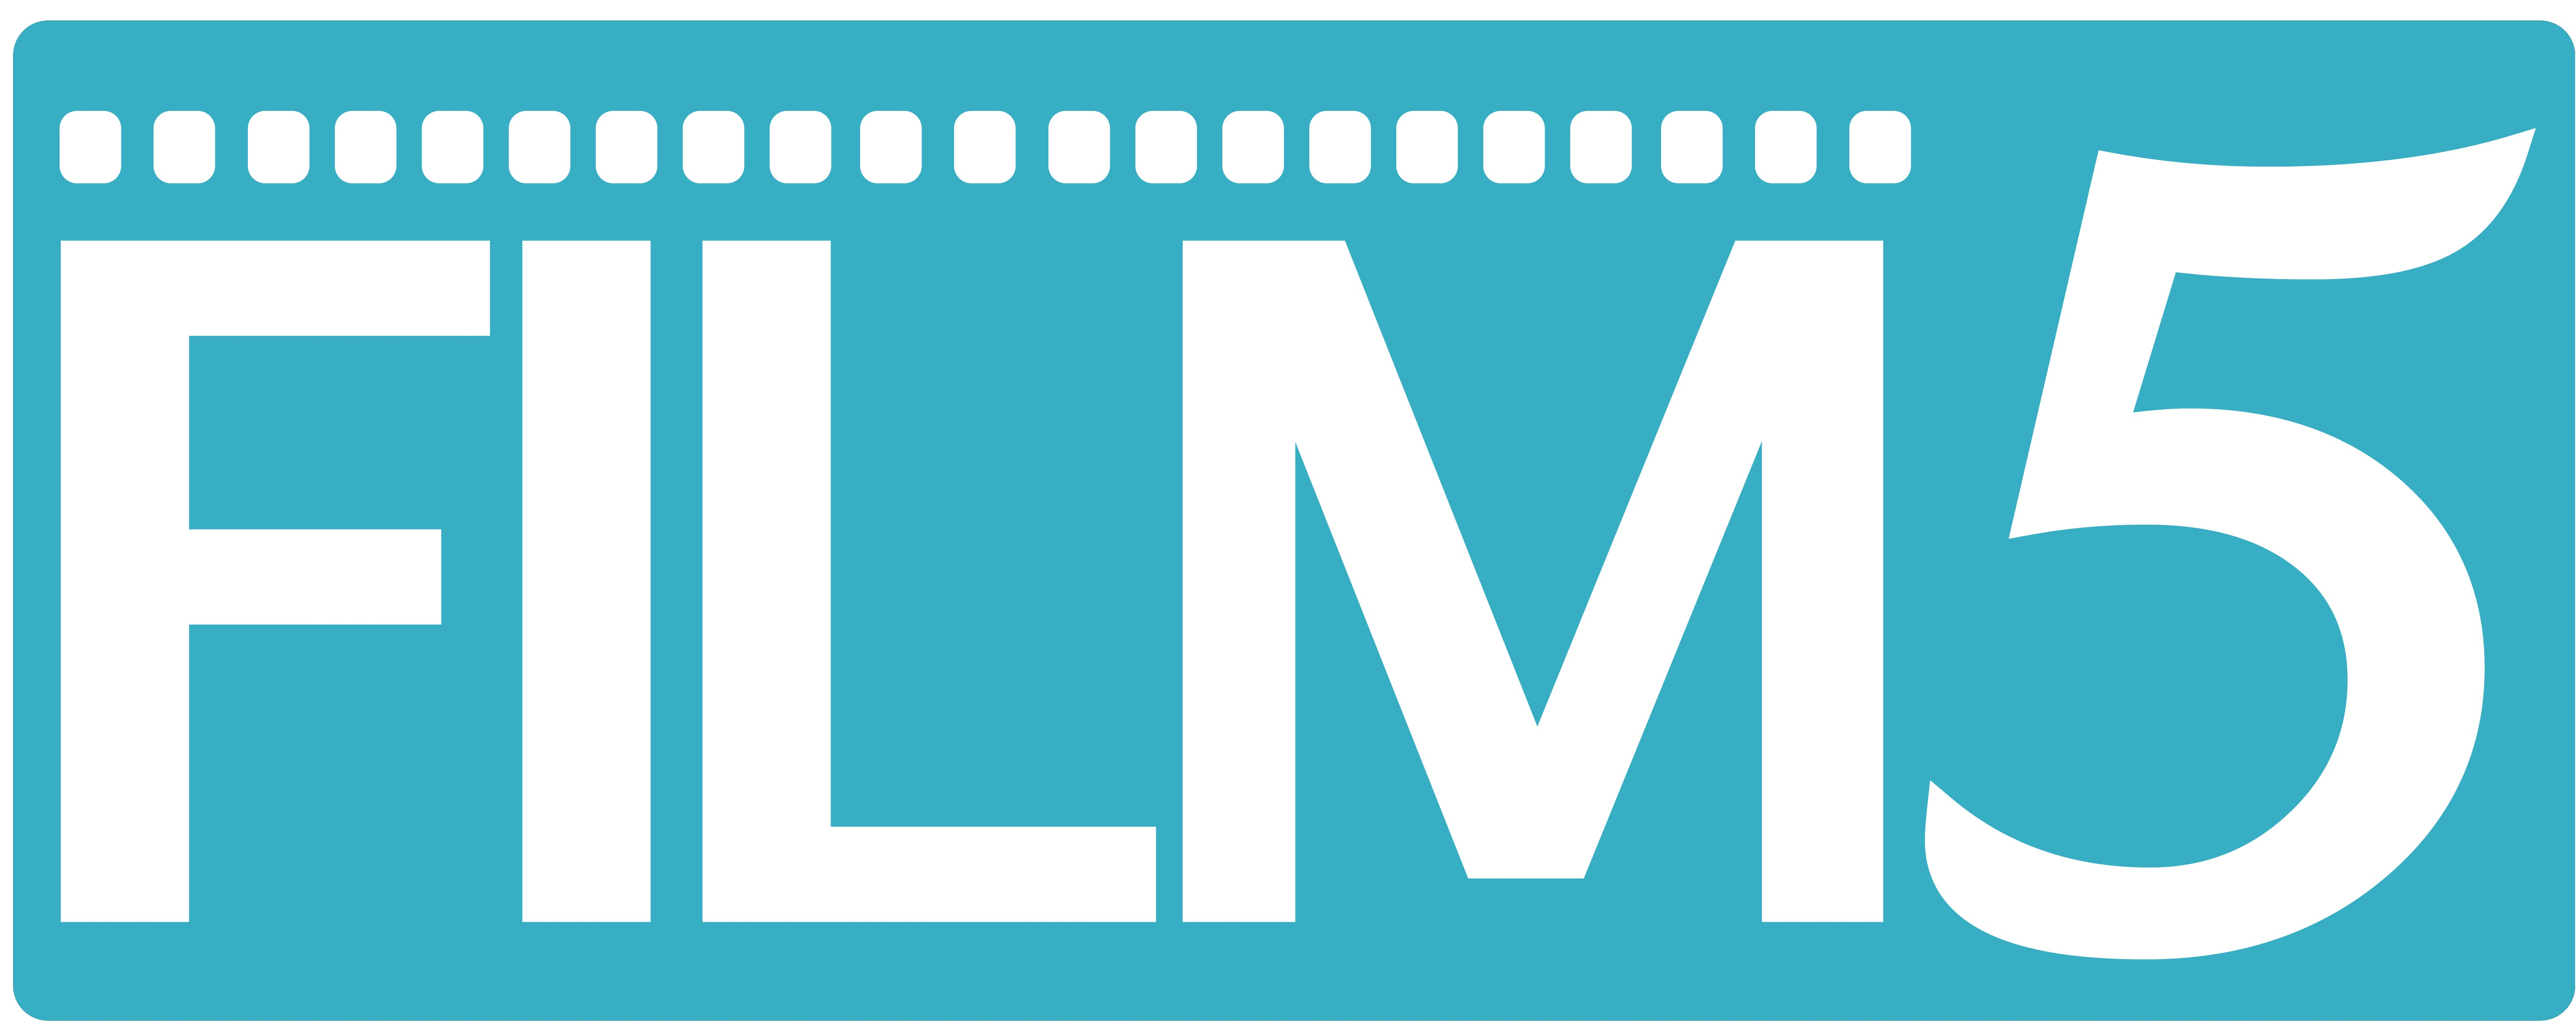 FILM5-TEAL2010-LGJPG